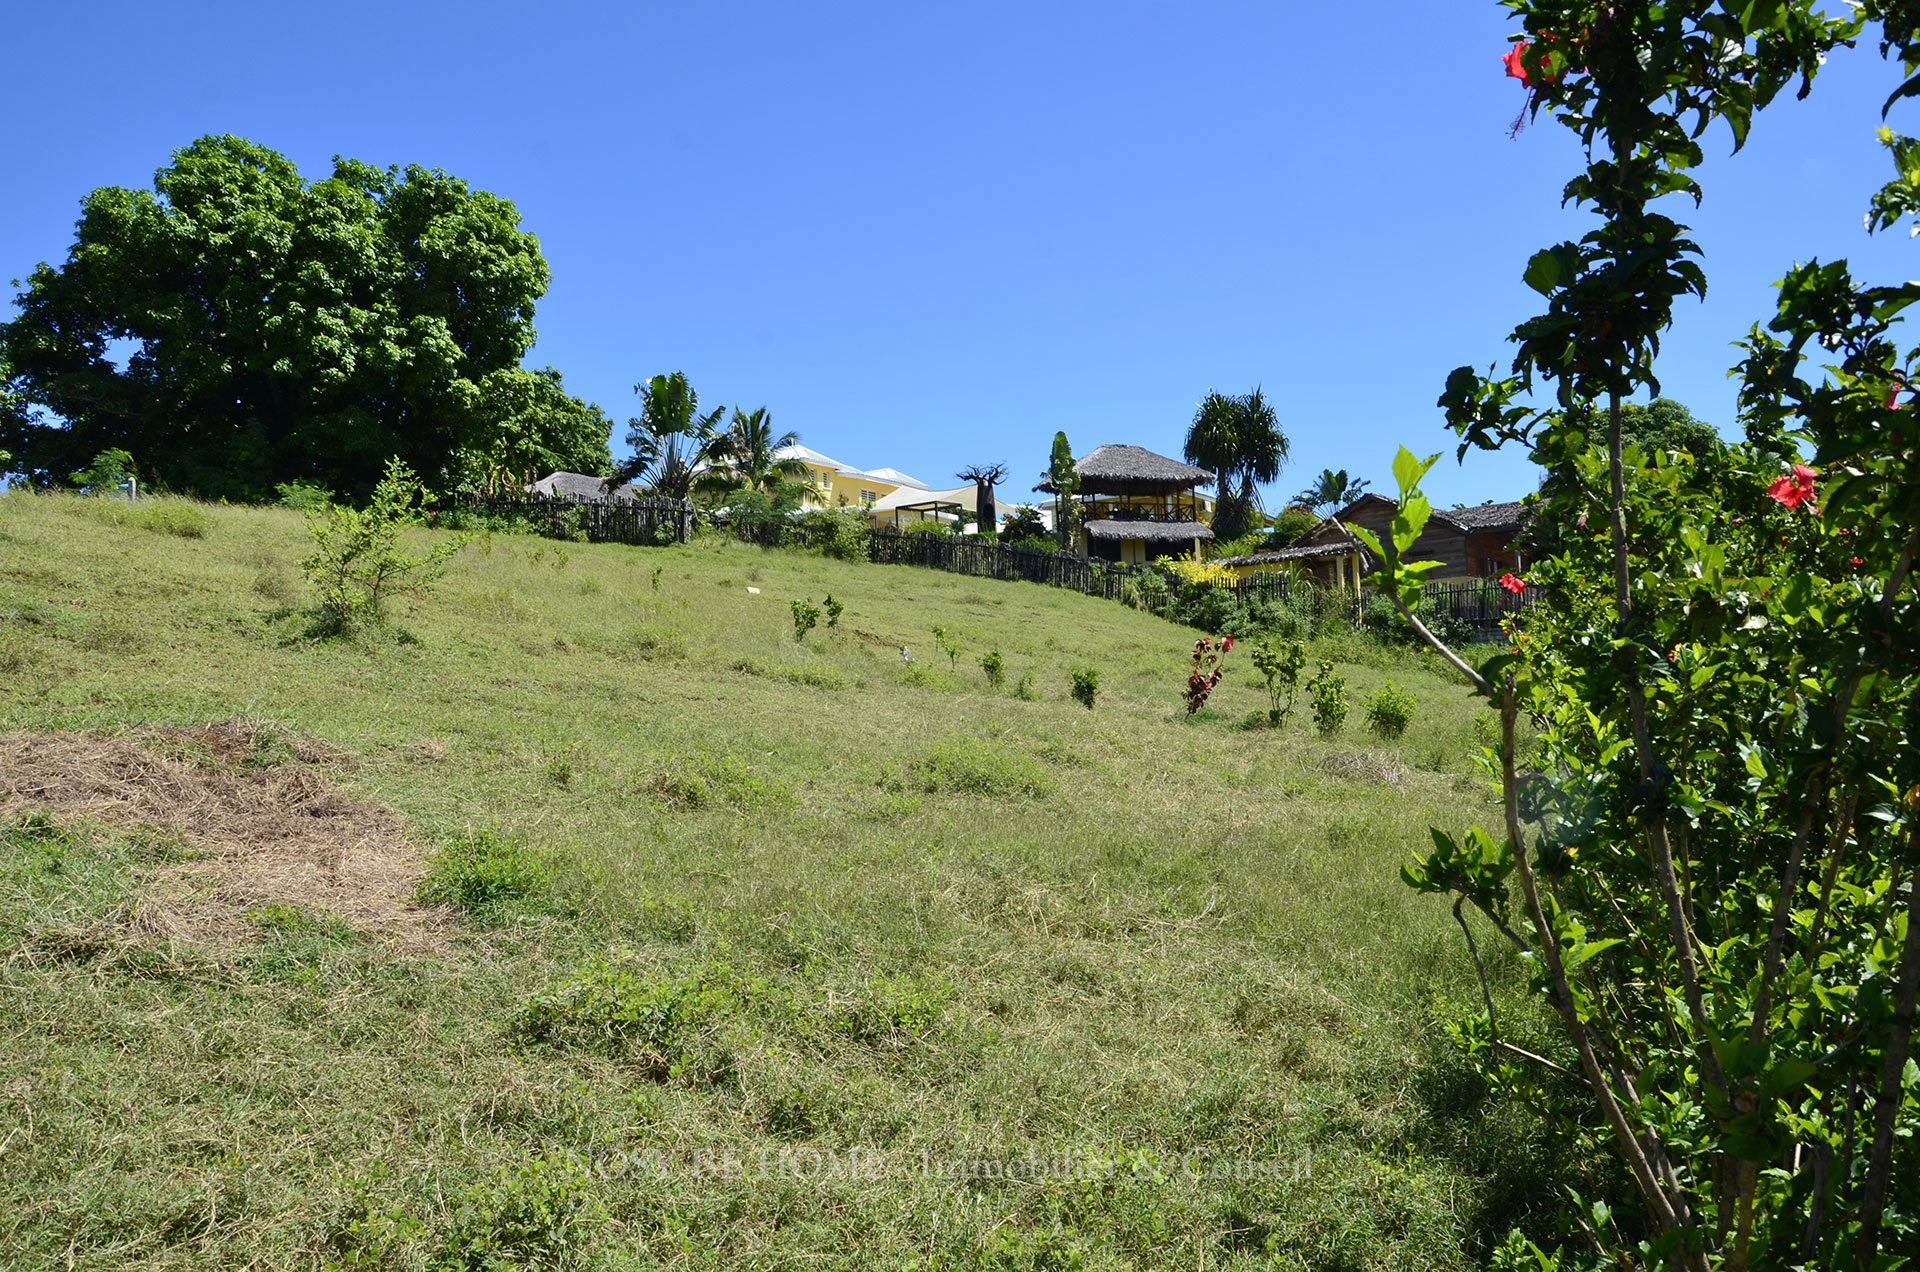 Sale Building land - Nosy Be - Madagascar